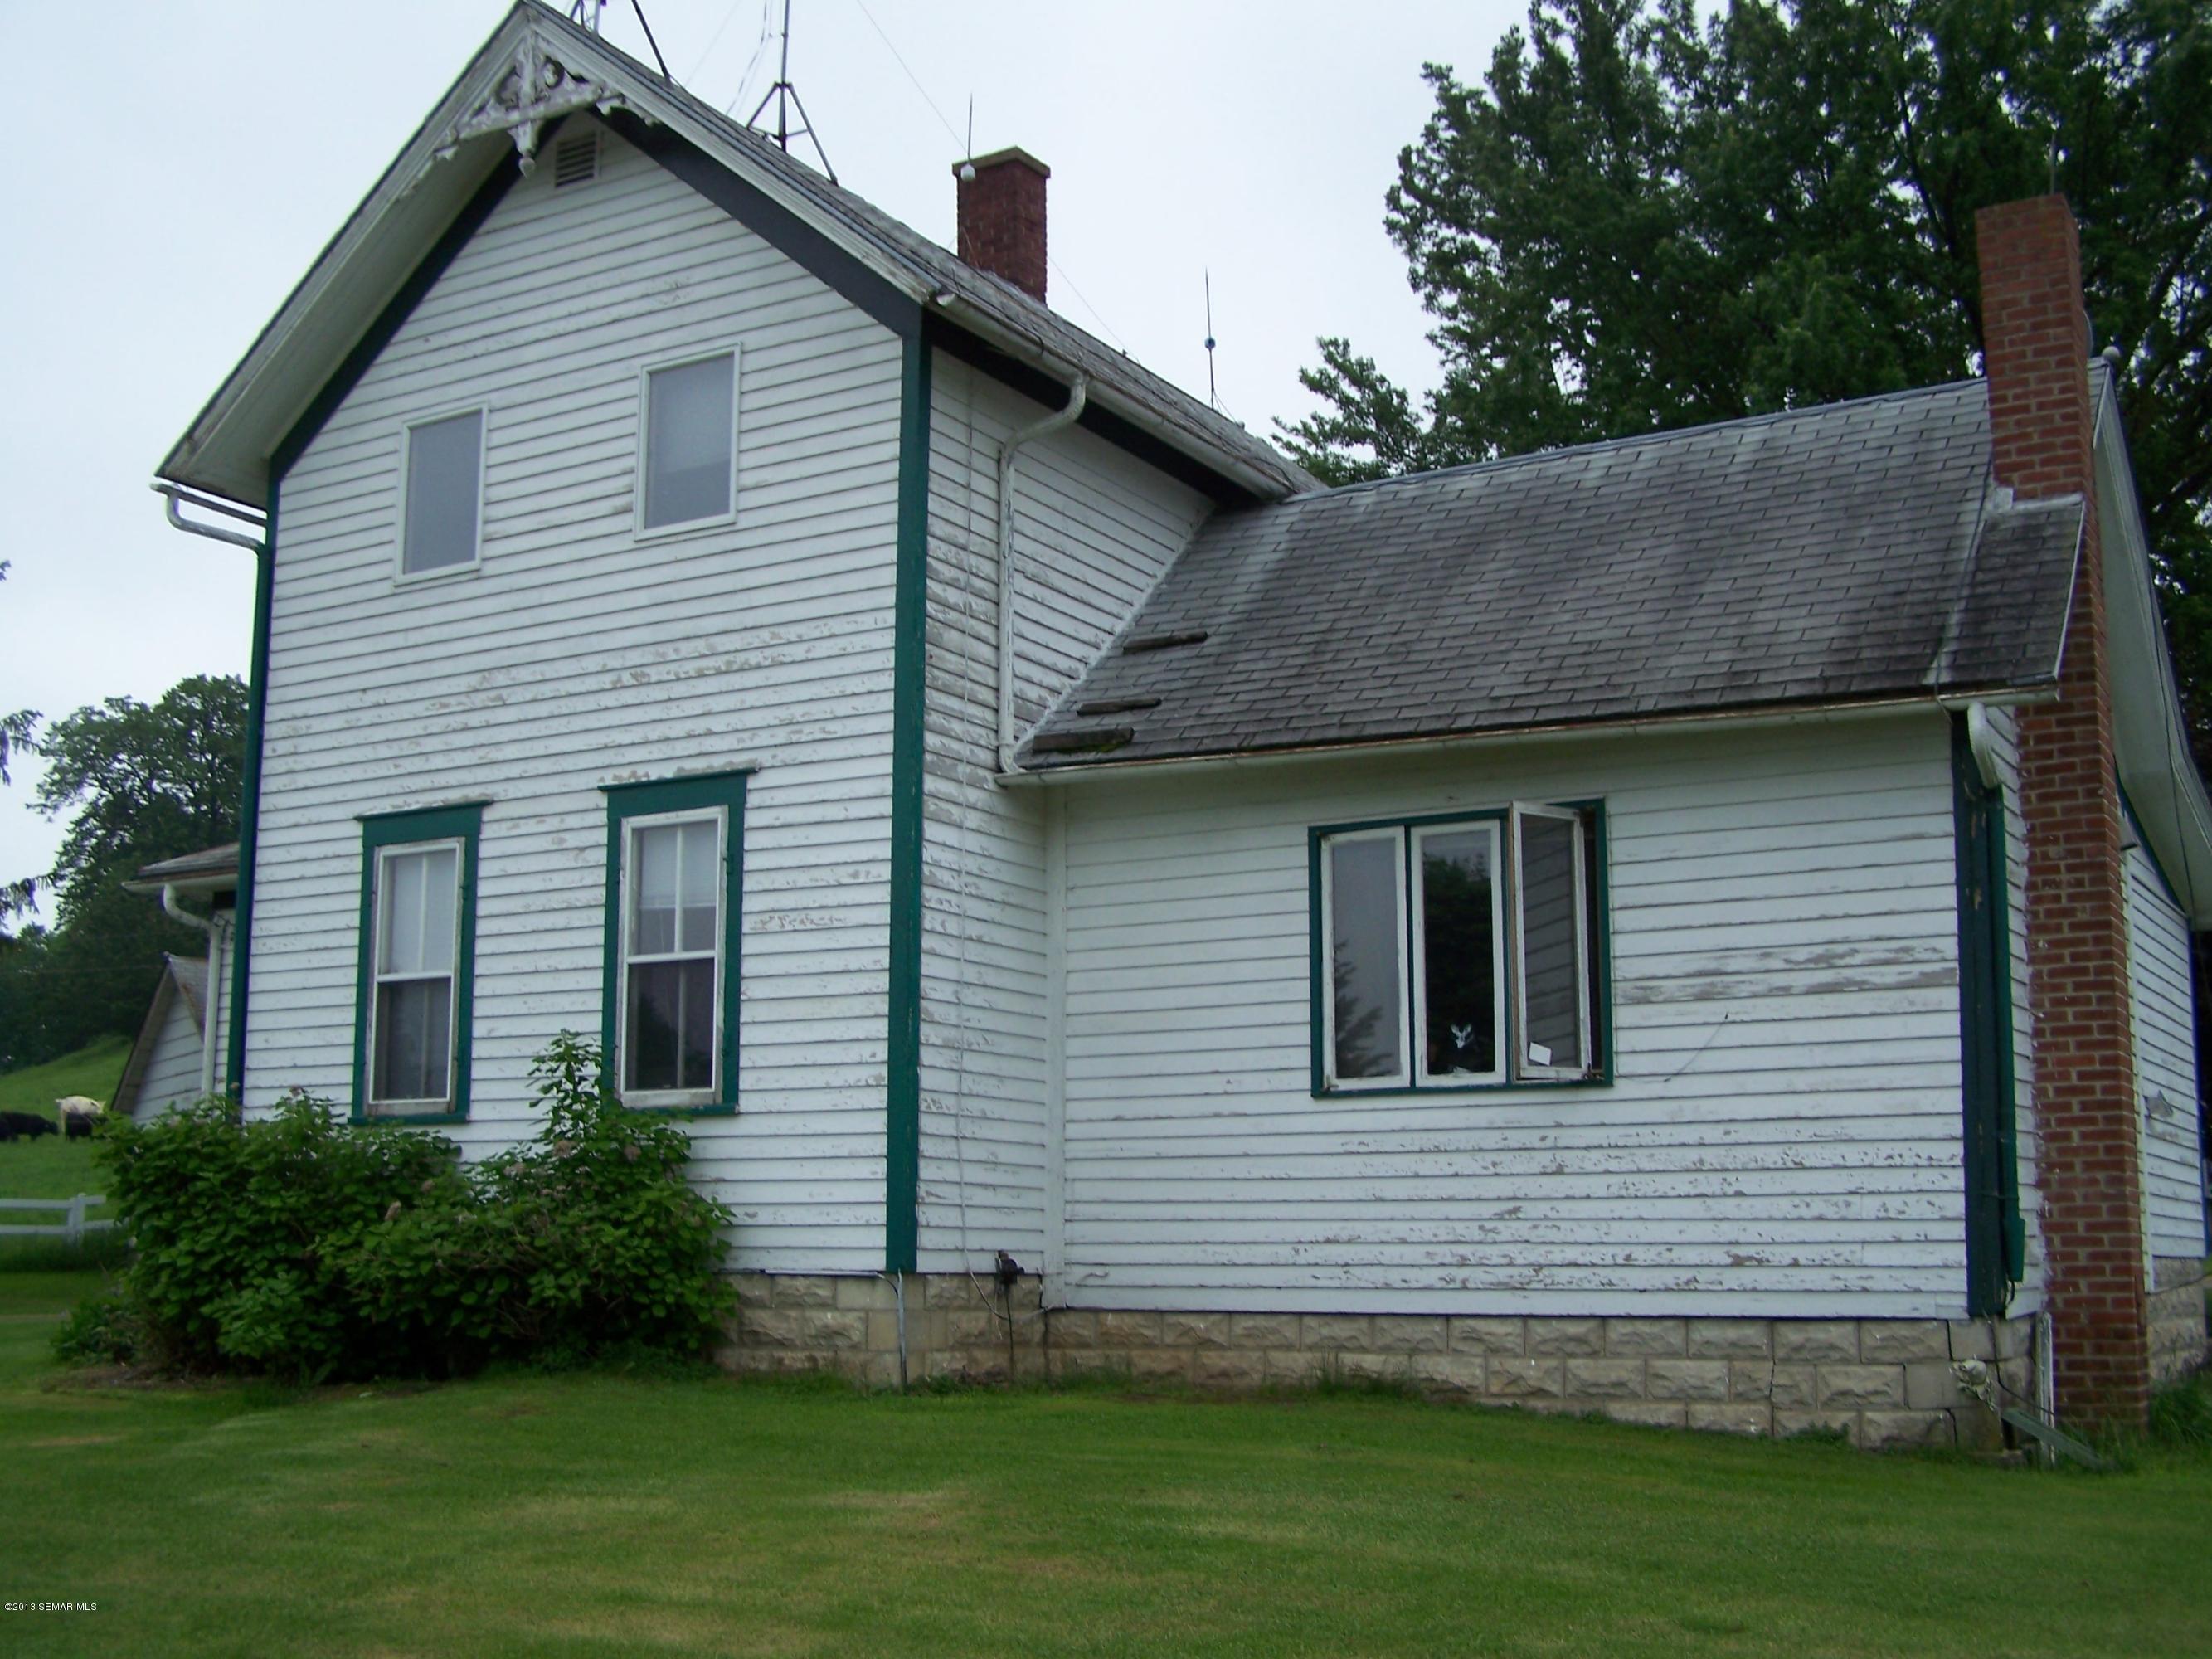 Real Estate for Sale, ListingId: 28043651, Lanesboro,MN55949